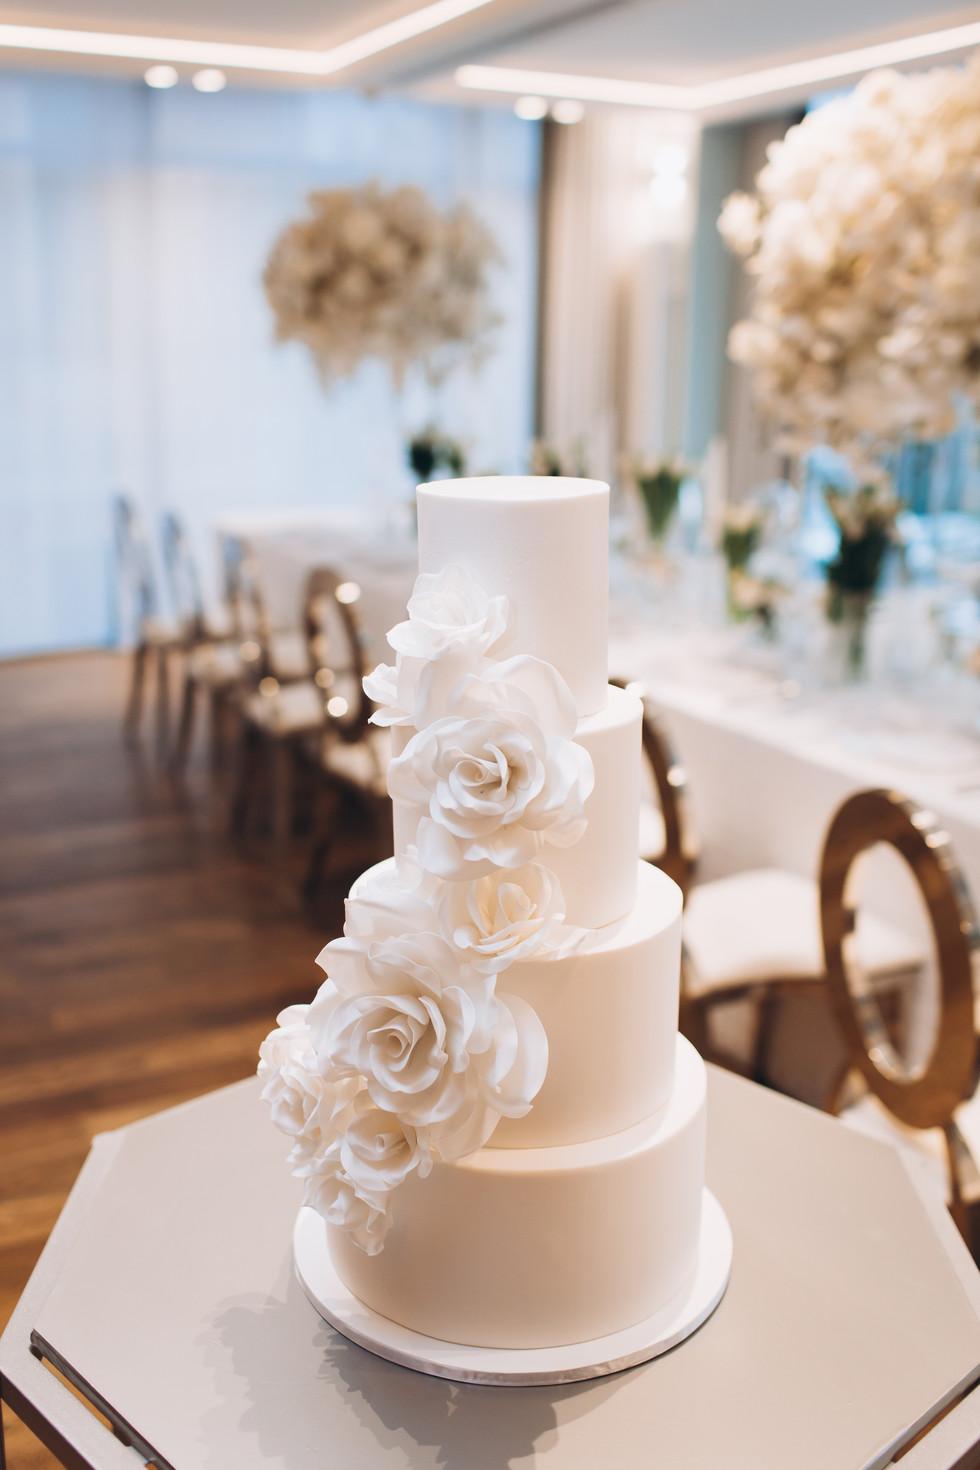 Exquisite White Wedding Cake WC20213